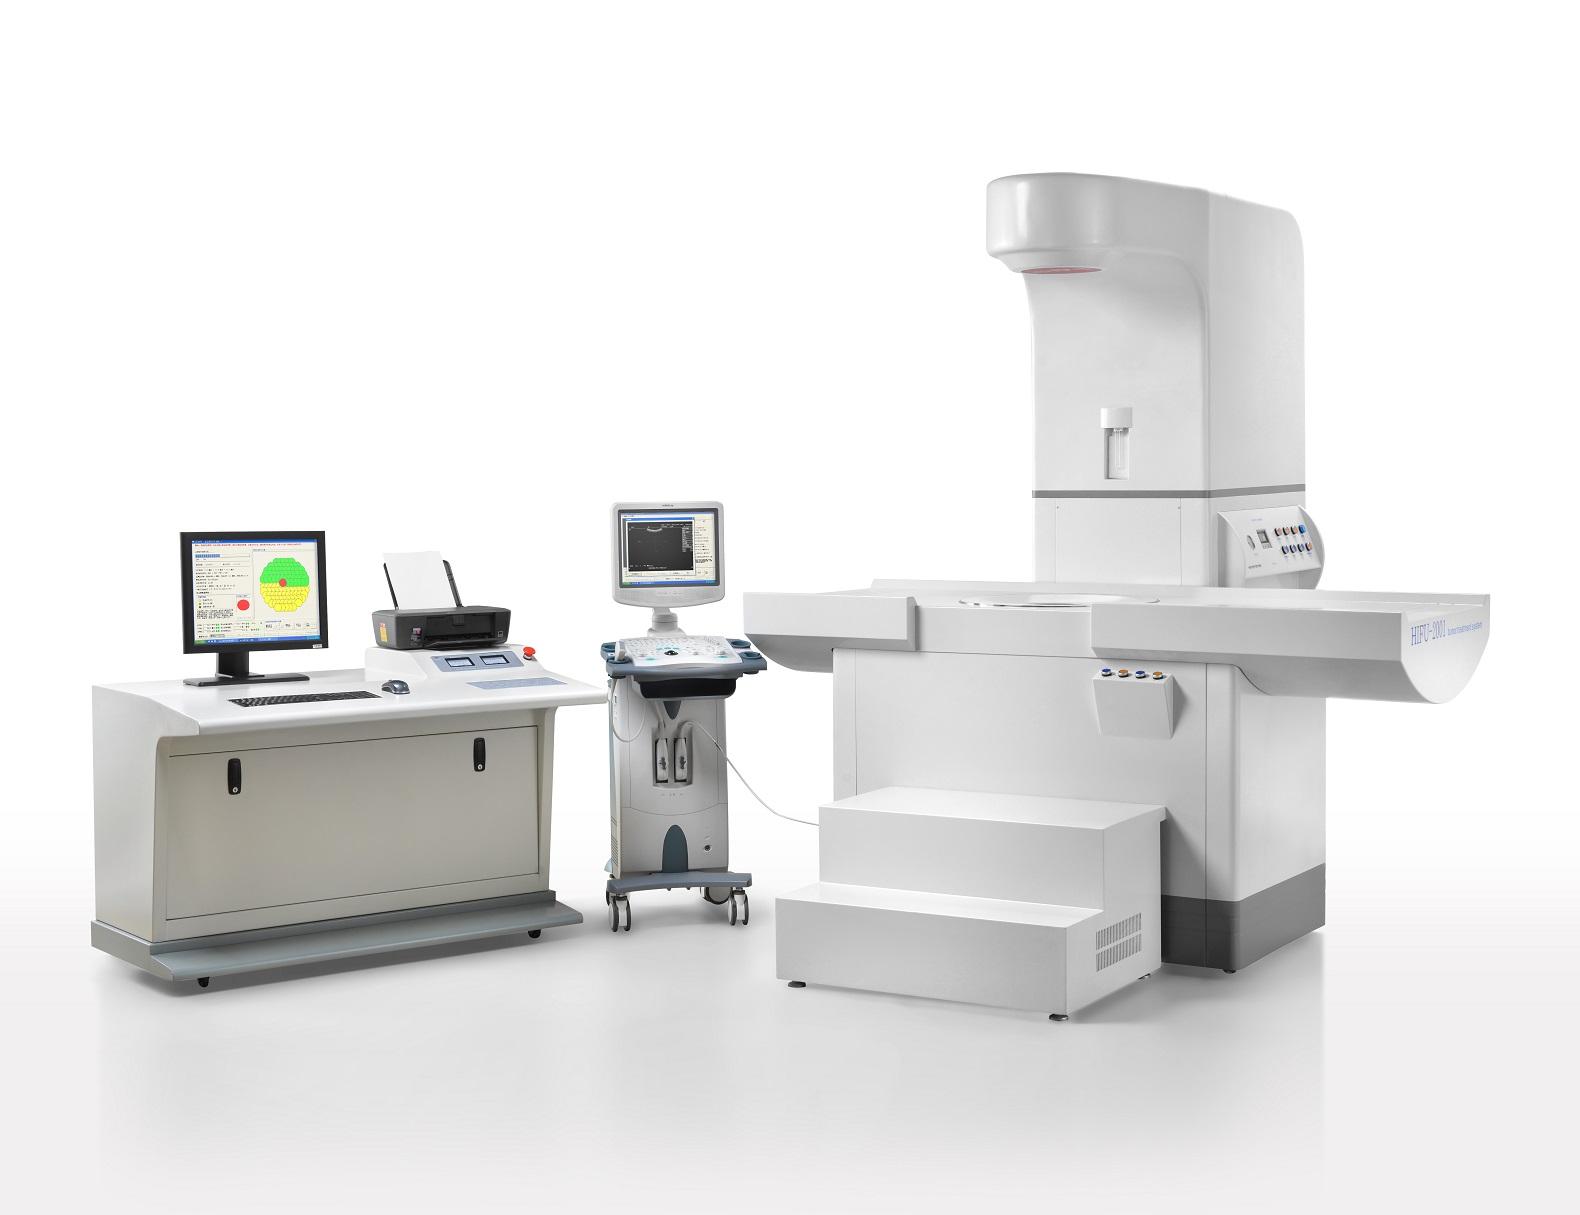 HIfU-2001 高强度聚焦超声肿瘤治疗系统